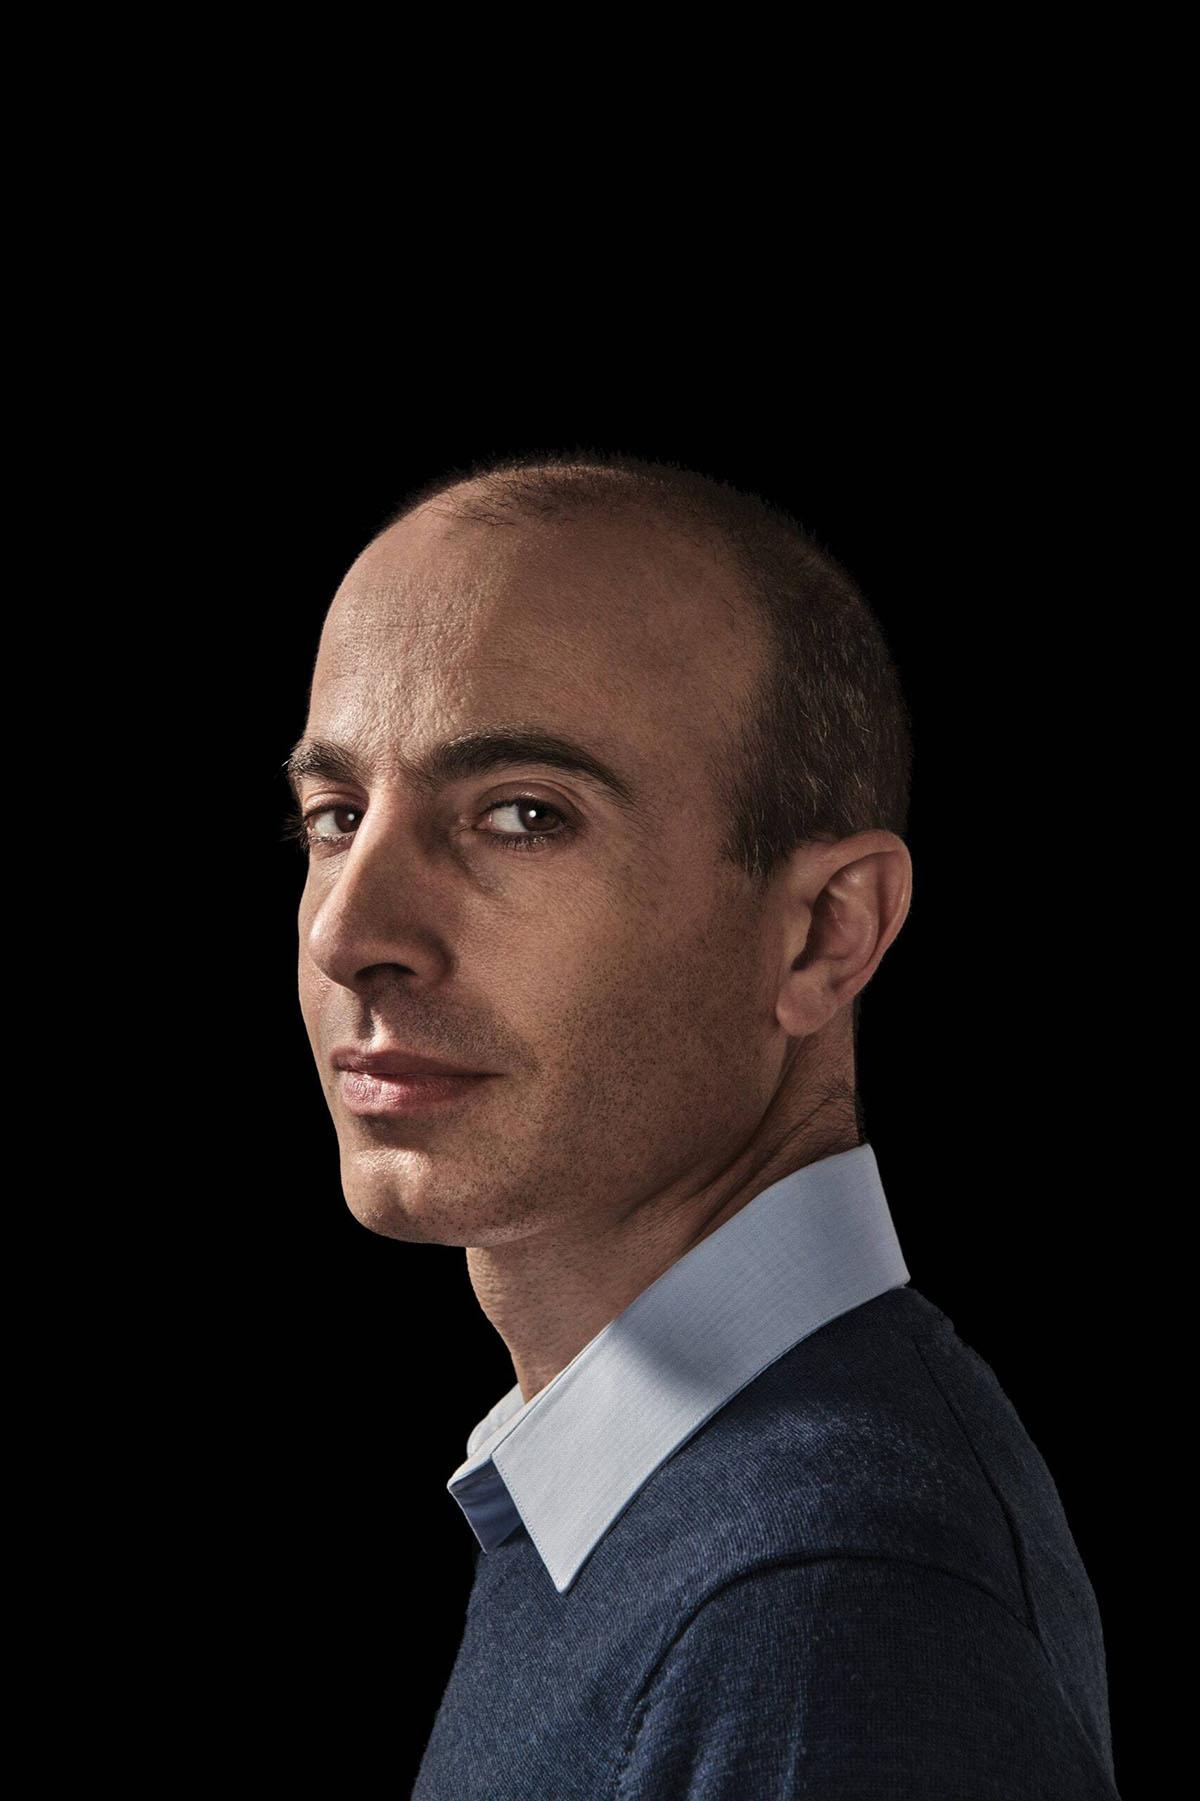 Yuval Noah Harari on The Story of Sapiens